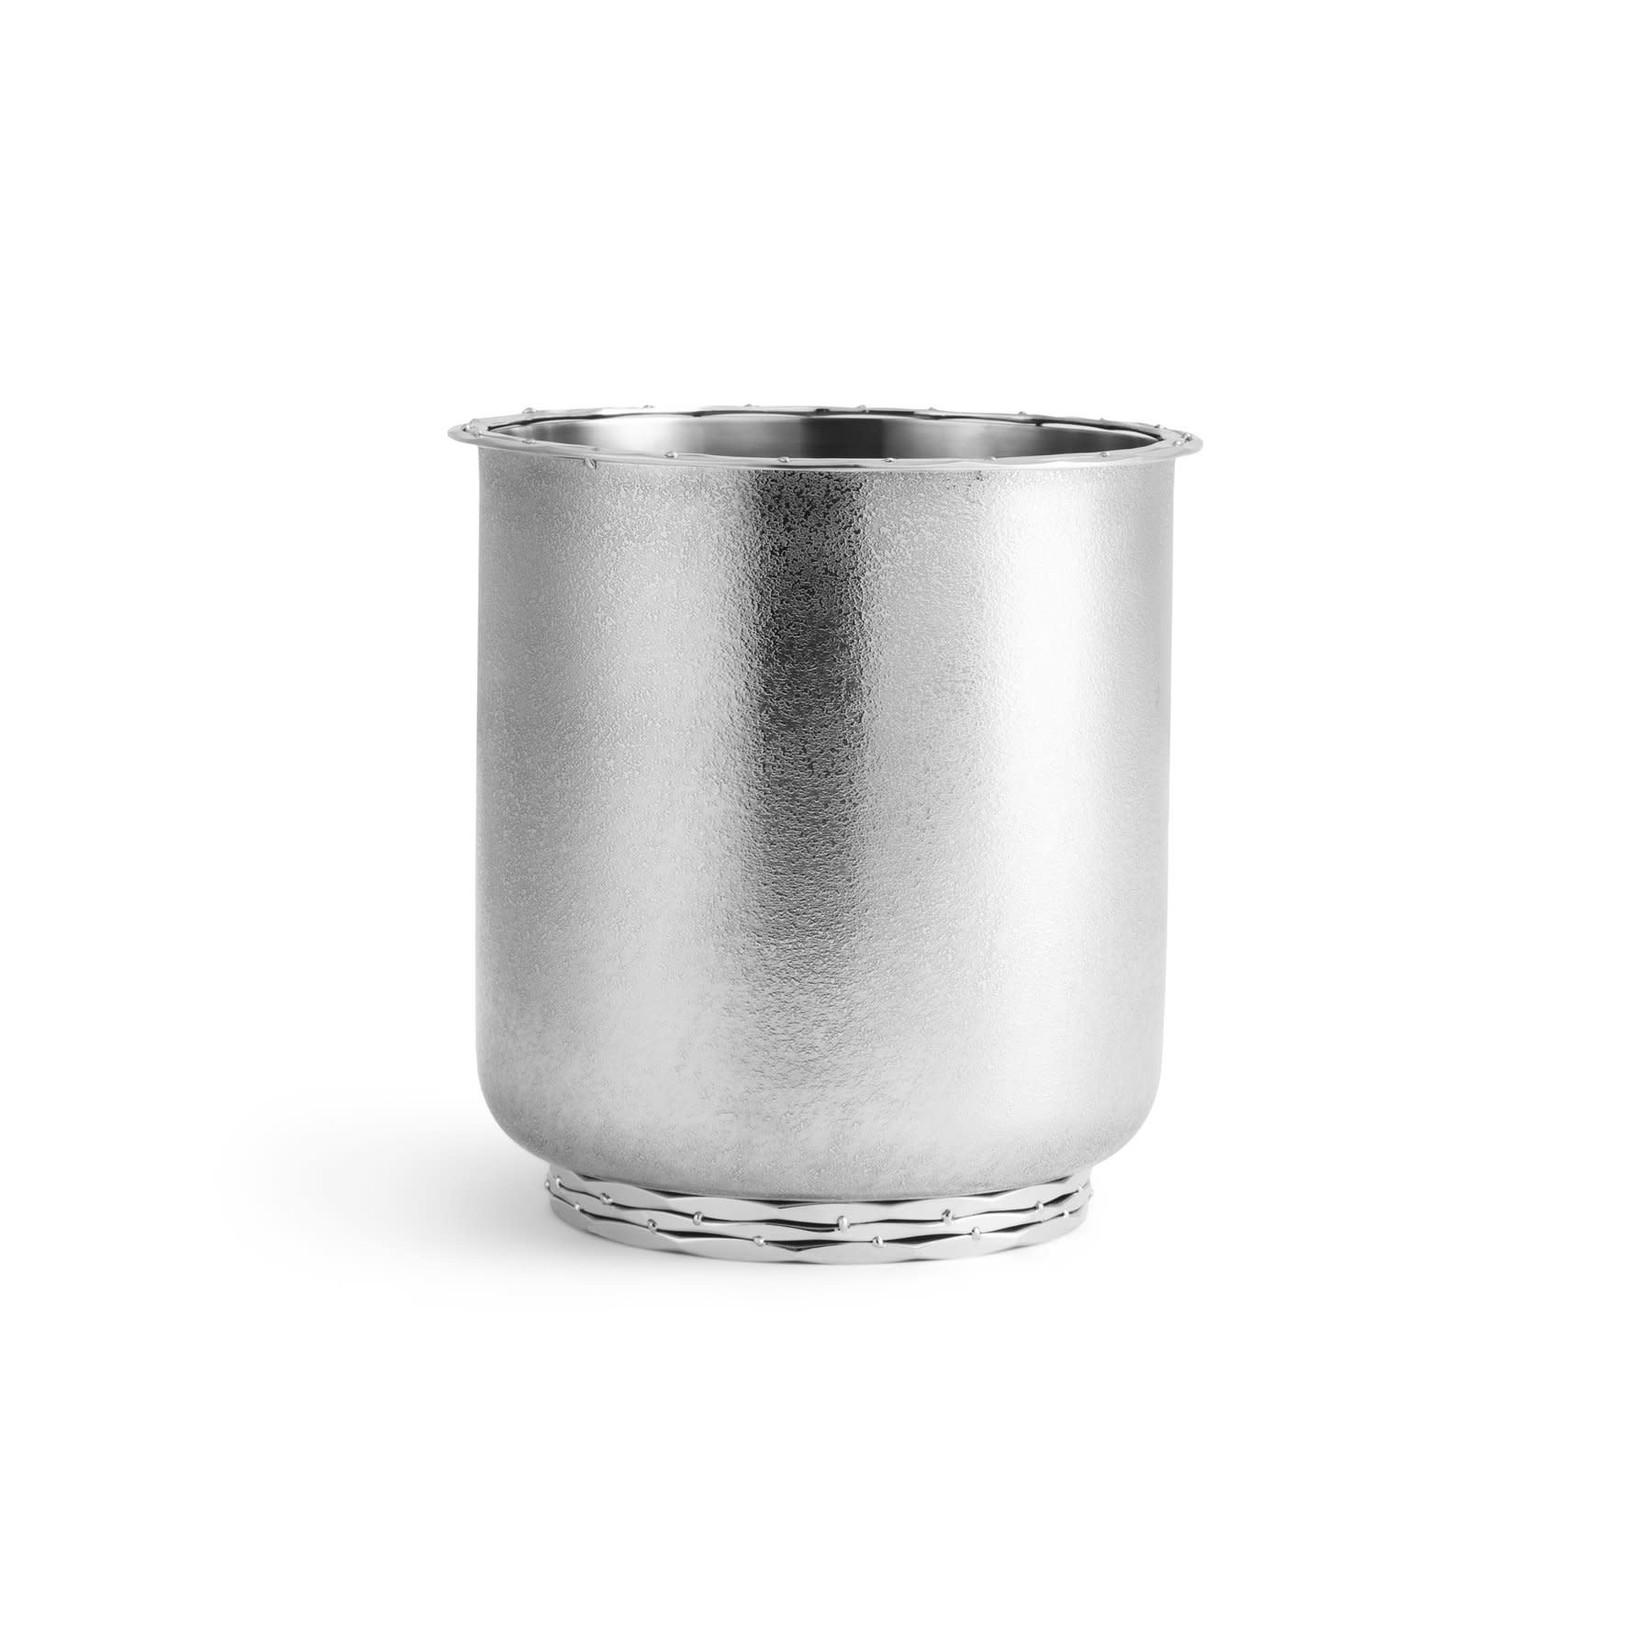 Michael Aram Mirage Bucket